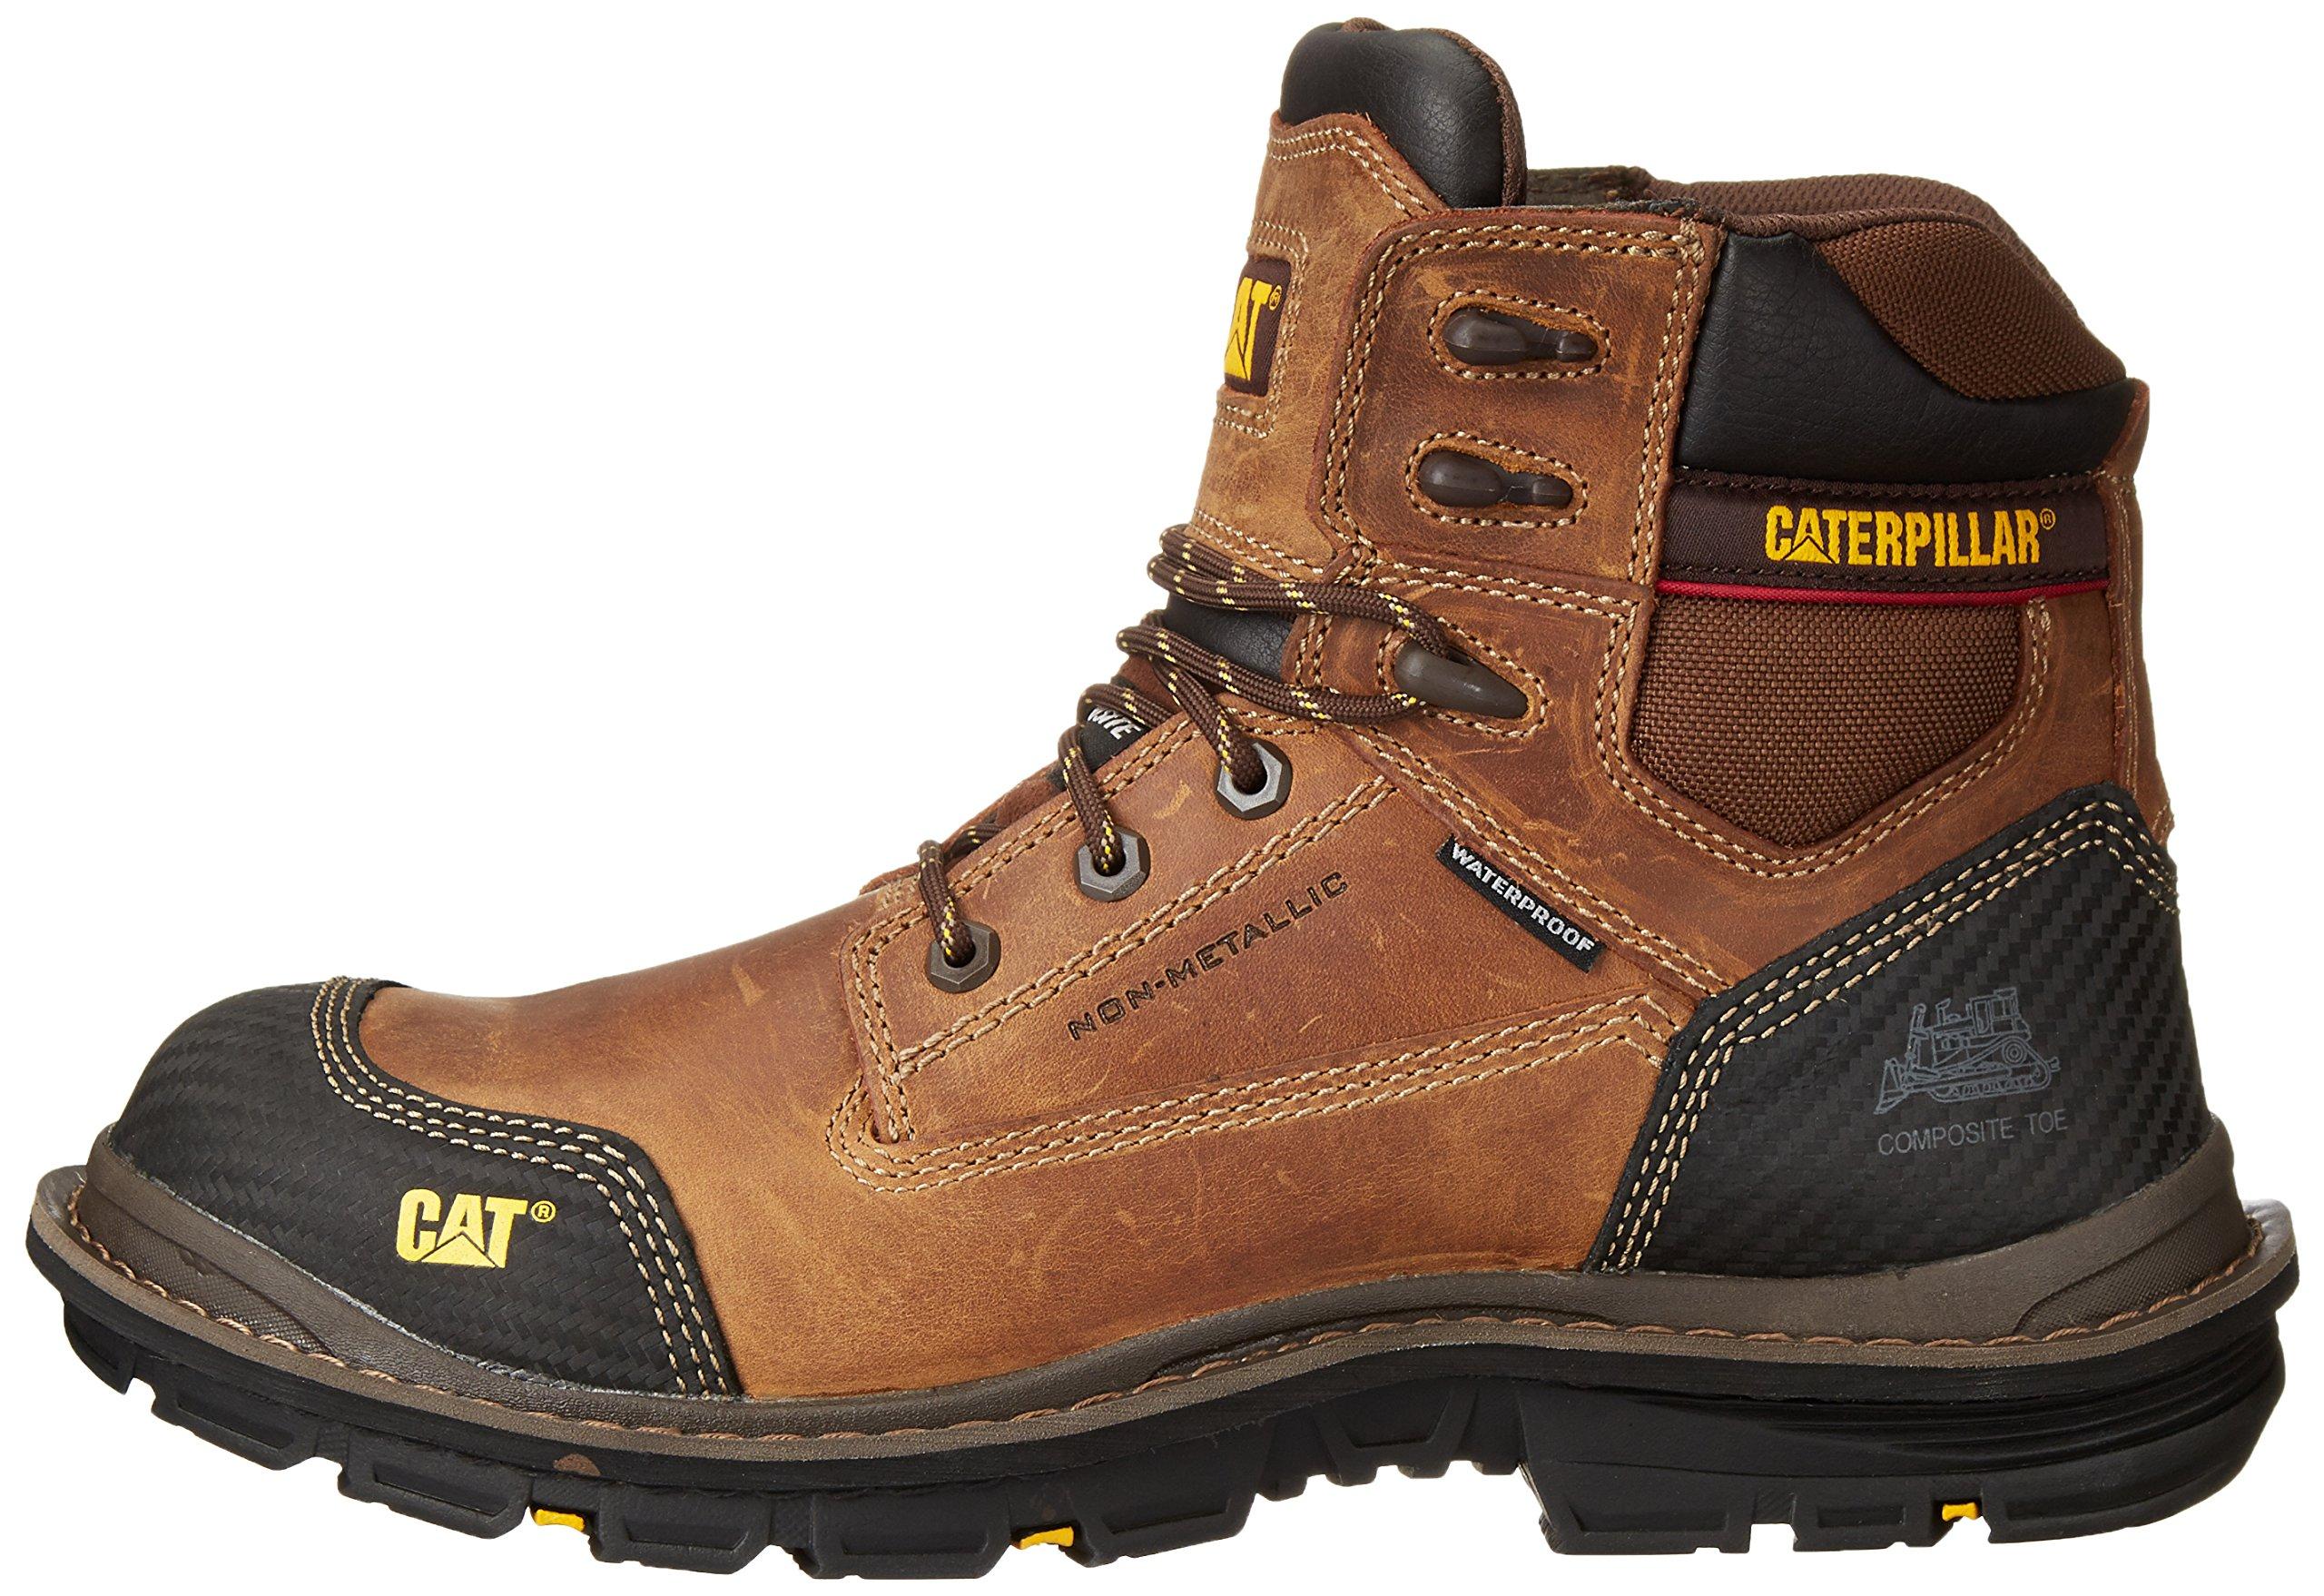 Caterpillar Men's Fabricate 6 Inch Tough Waterproof Comp Toe Work Boot, Brown, 14 M US by Caterpillar (Image #5)